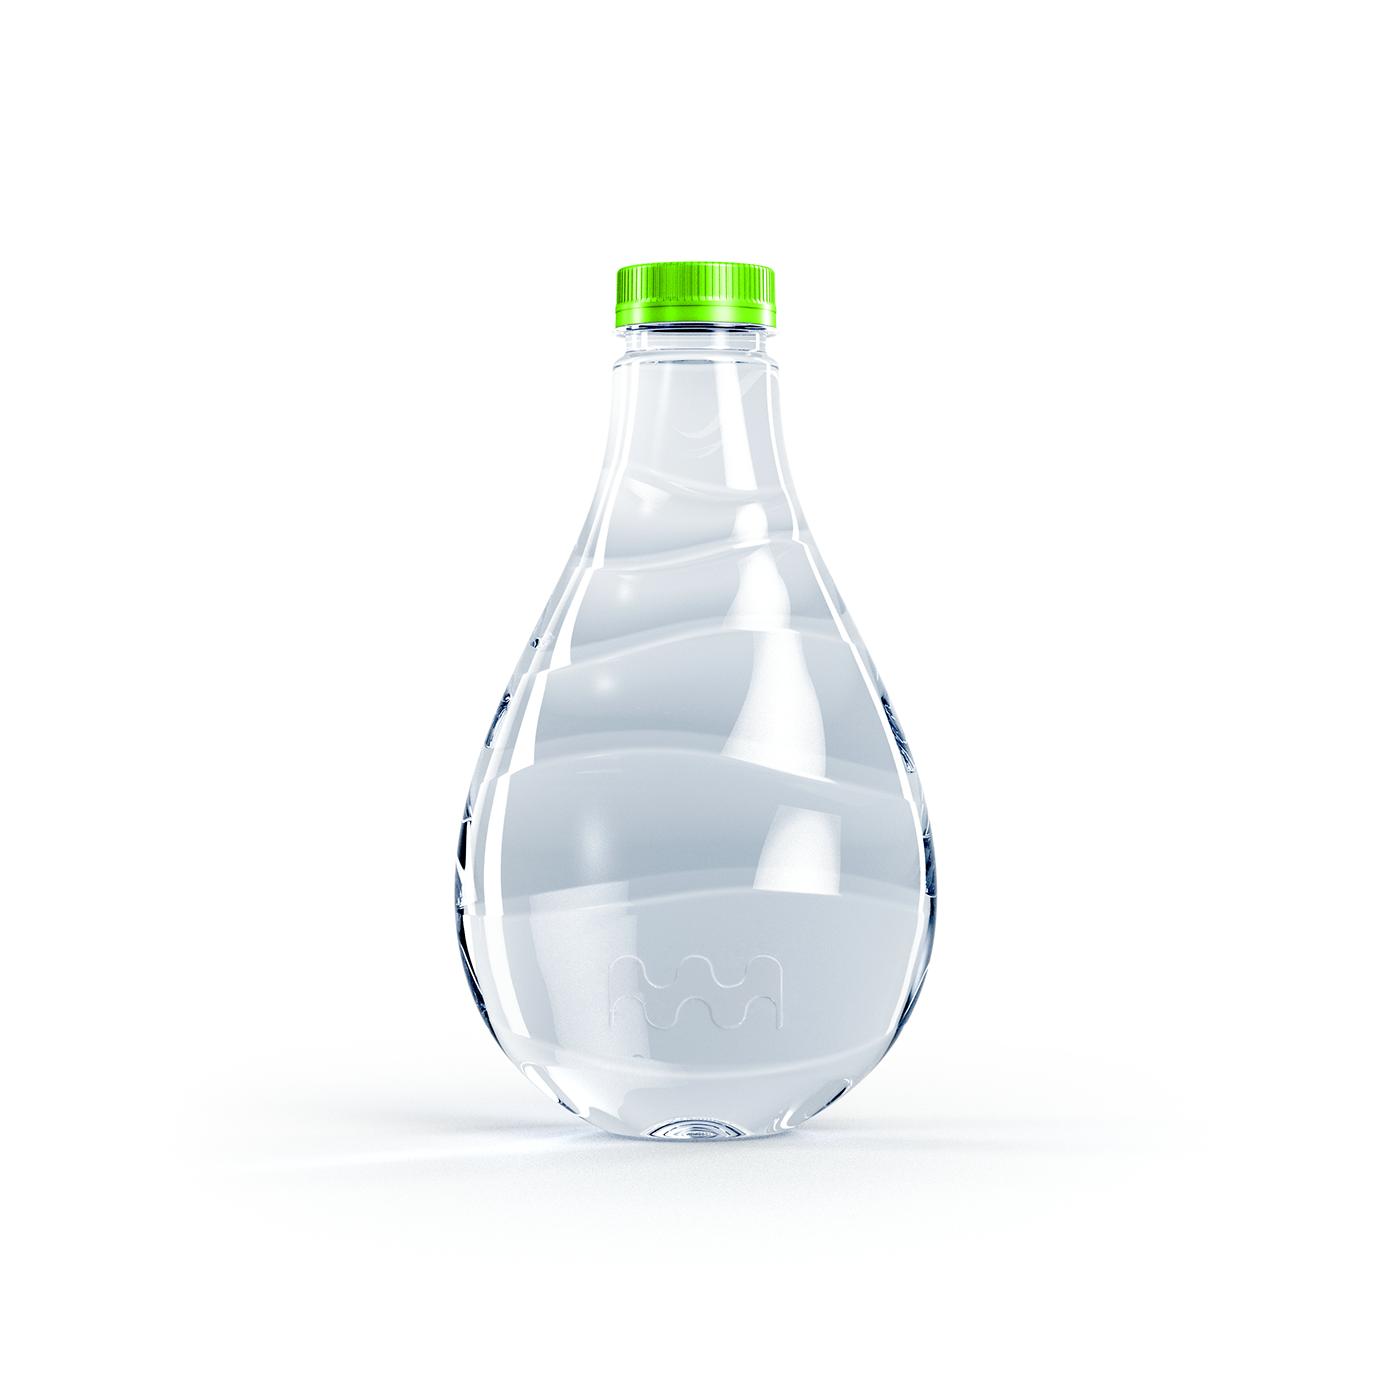 Vimagua Reusable Water Bottle On Behance